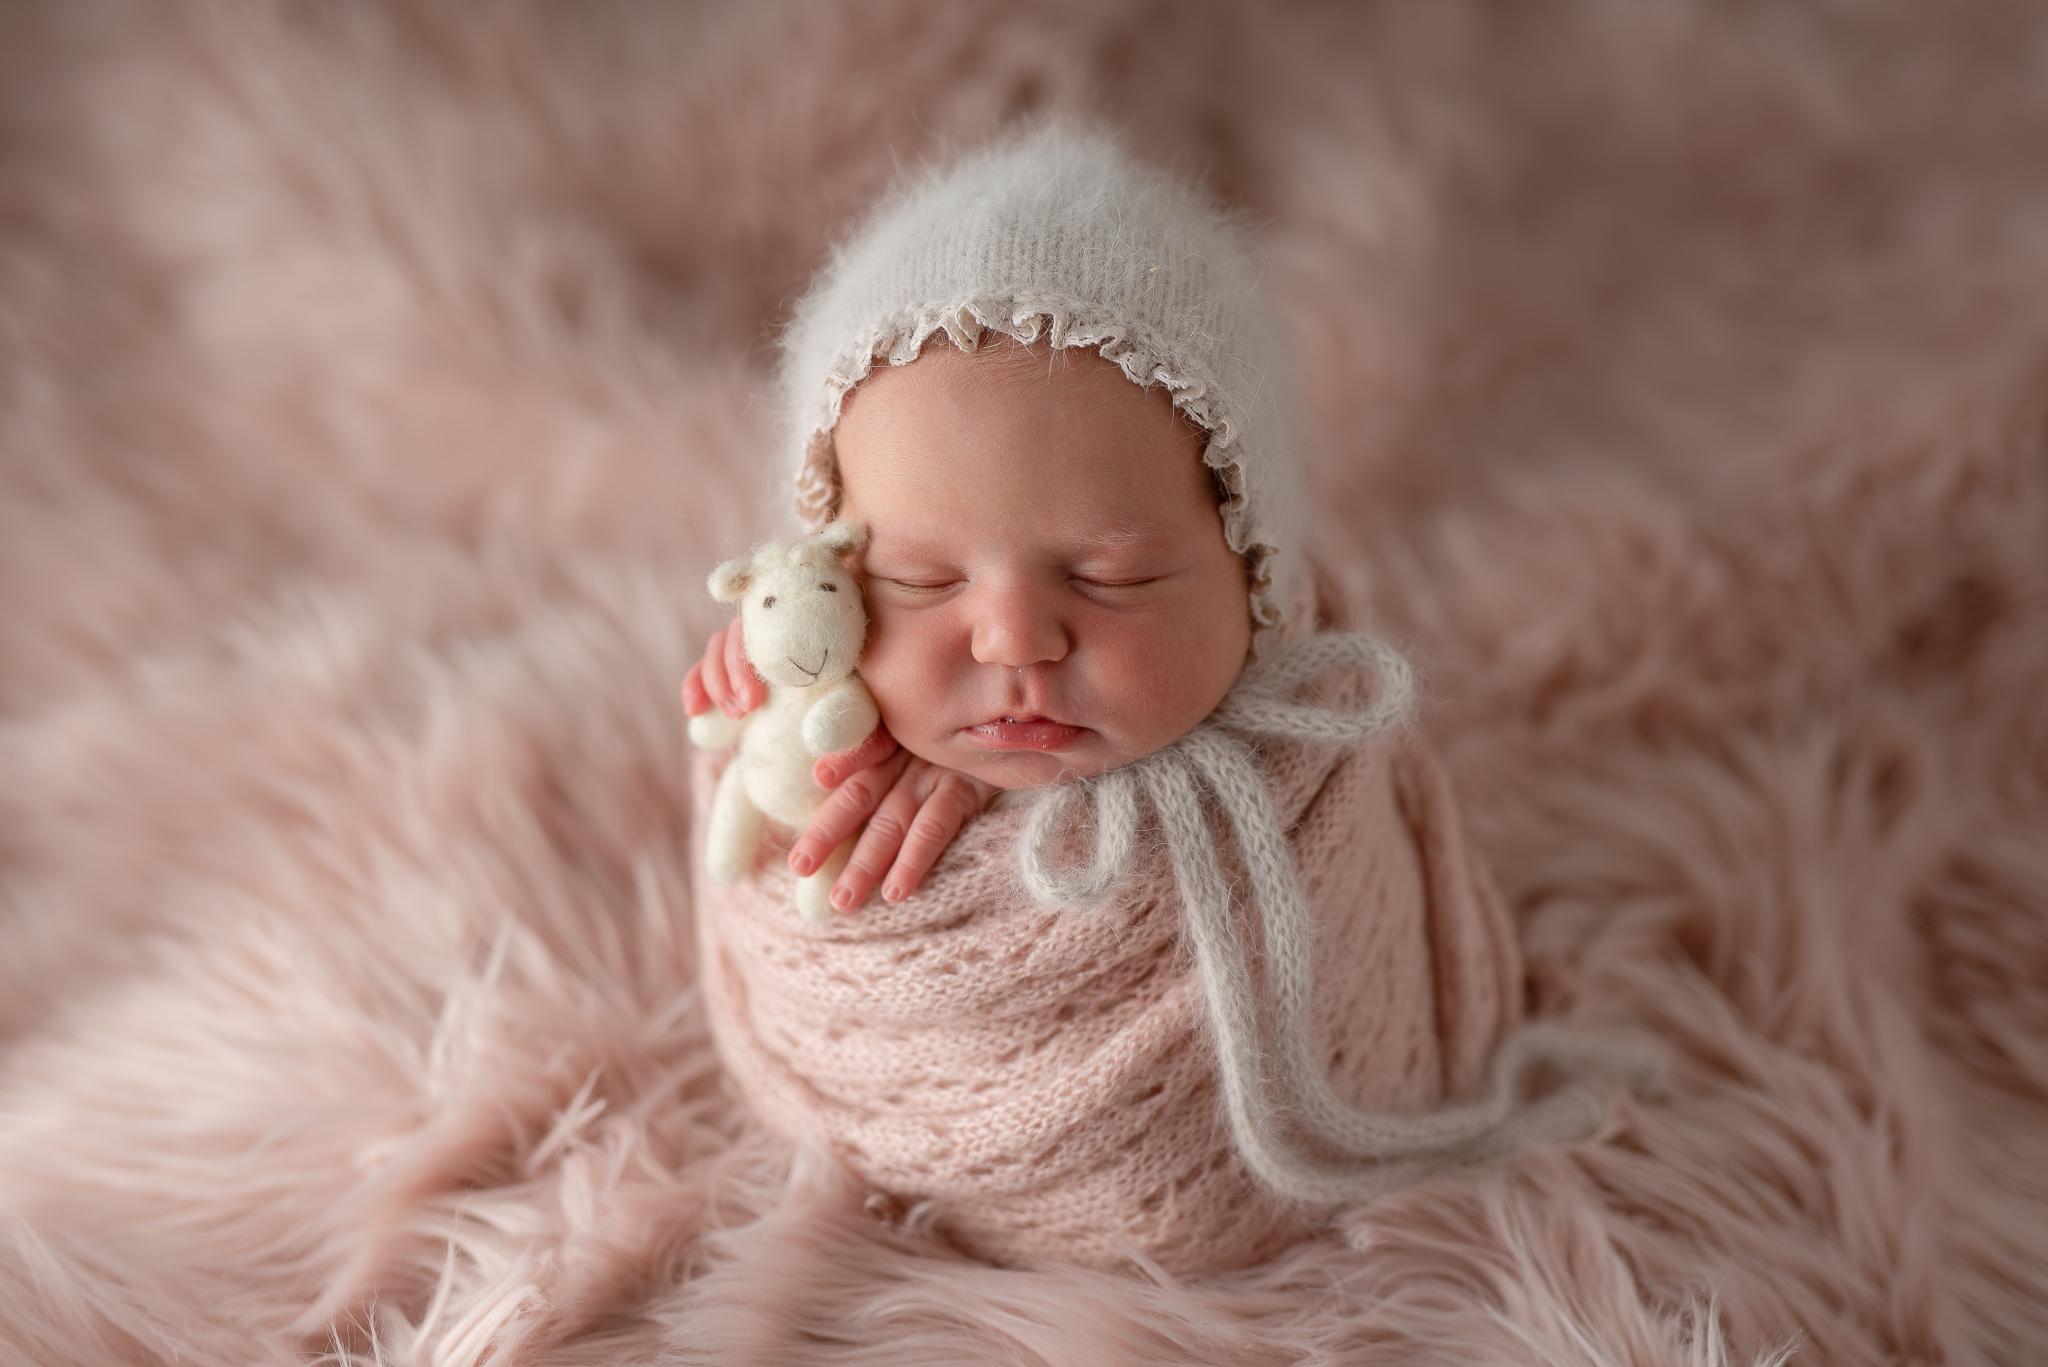 Newborn43NaomiLuciennePhotography032019-Edit.jpg